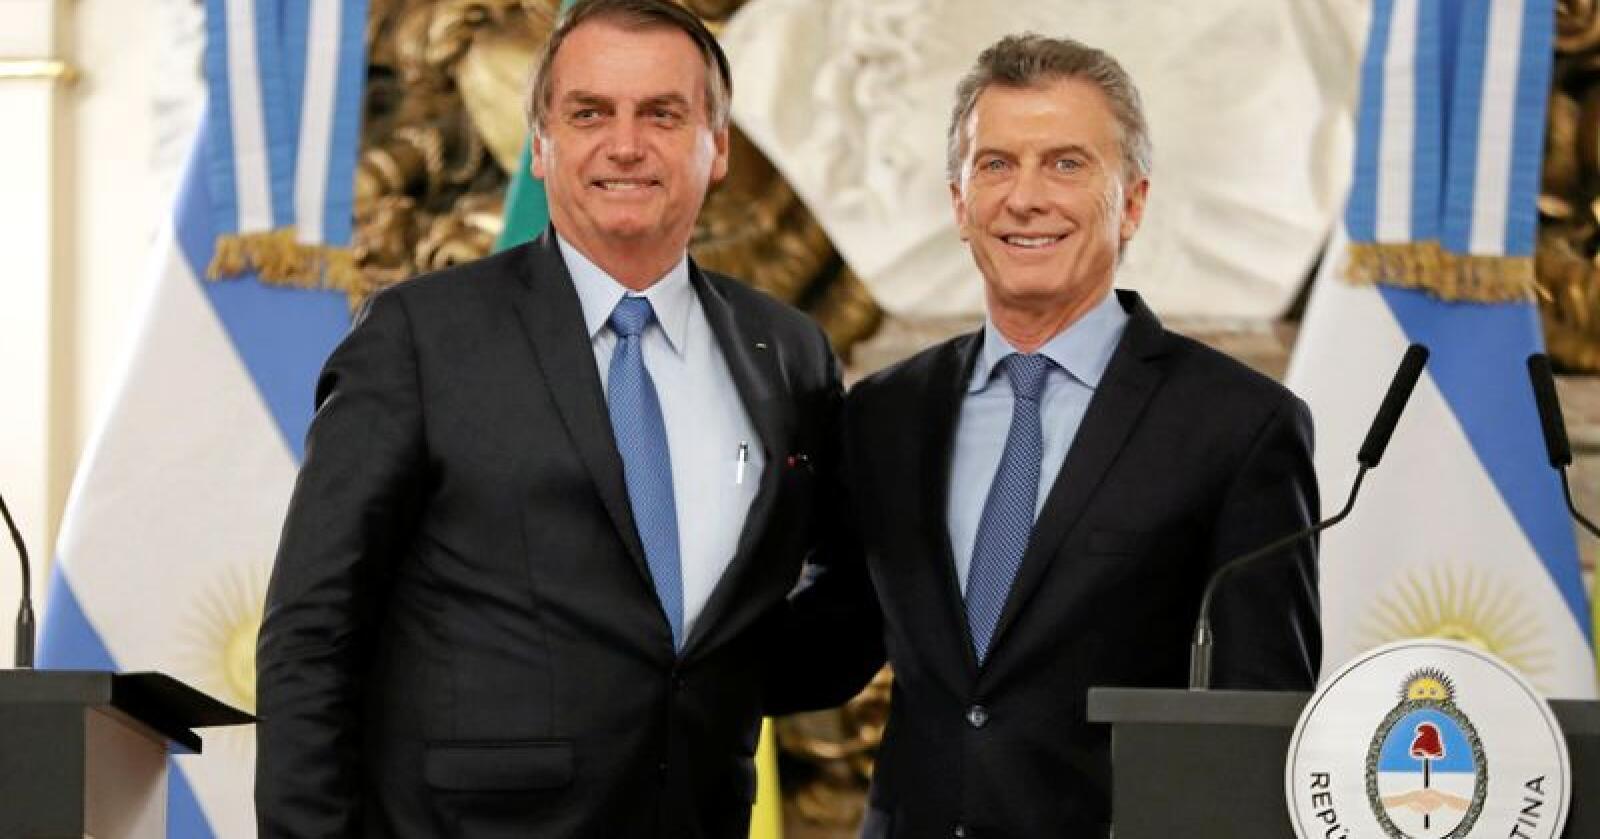 Brasils president Jair Bolsonaro (t.v.) og Argentinas president Mauricio Macri får bondeskryt for handelsavtalen de vil inngå med EU. Foto: Natacha Pisarenko / AP / NTB Scanpix